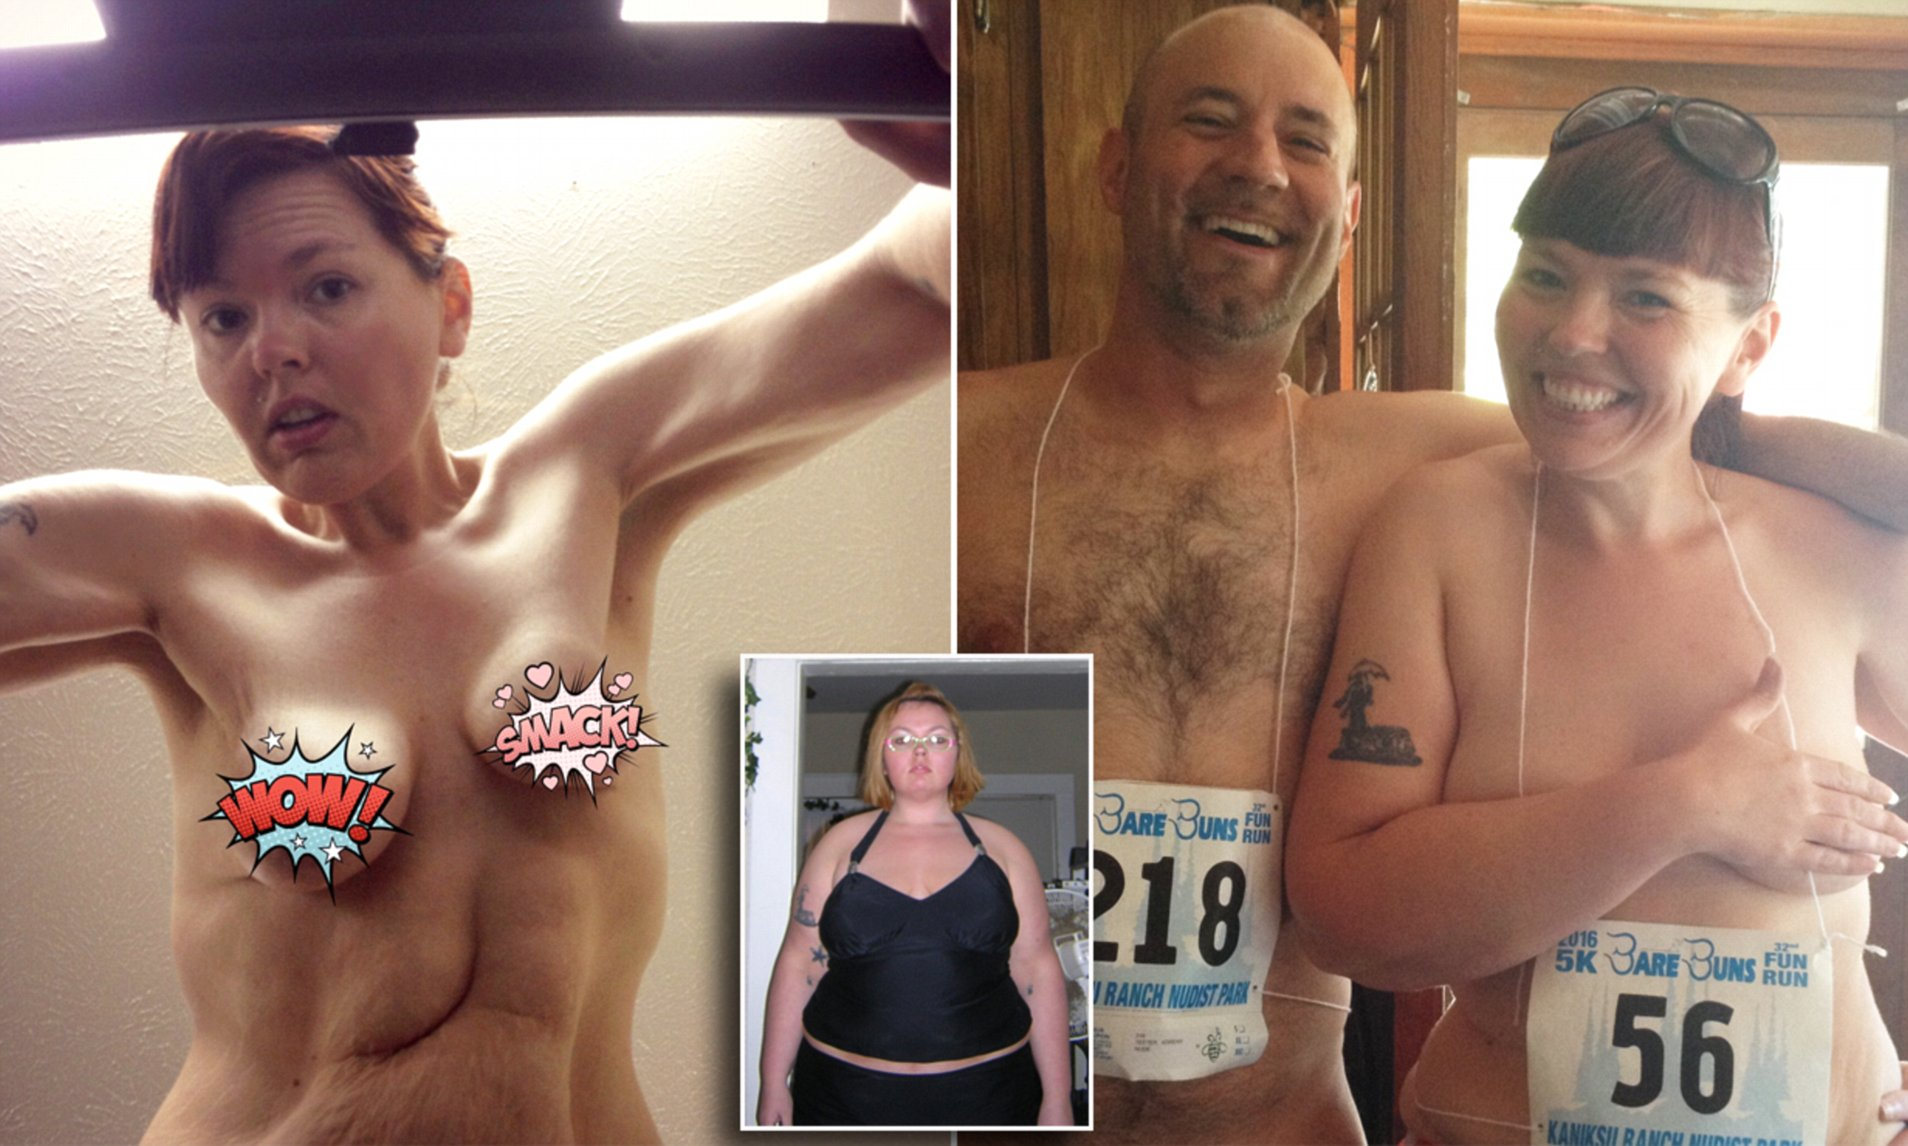 Free nudist photos barebuns